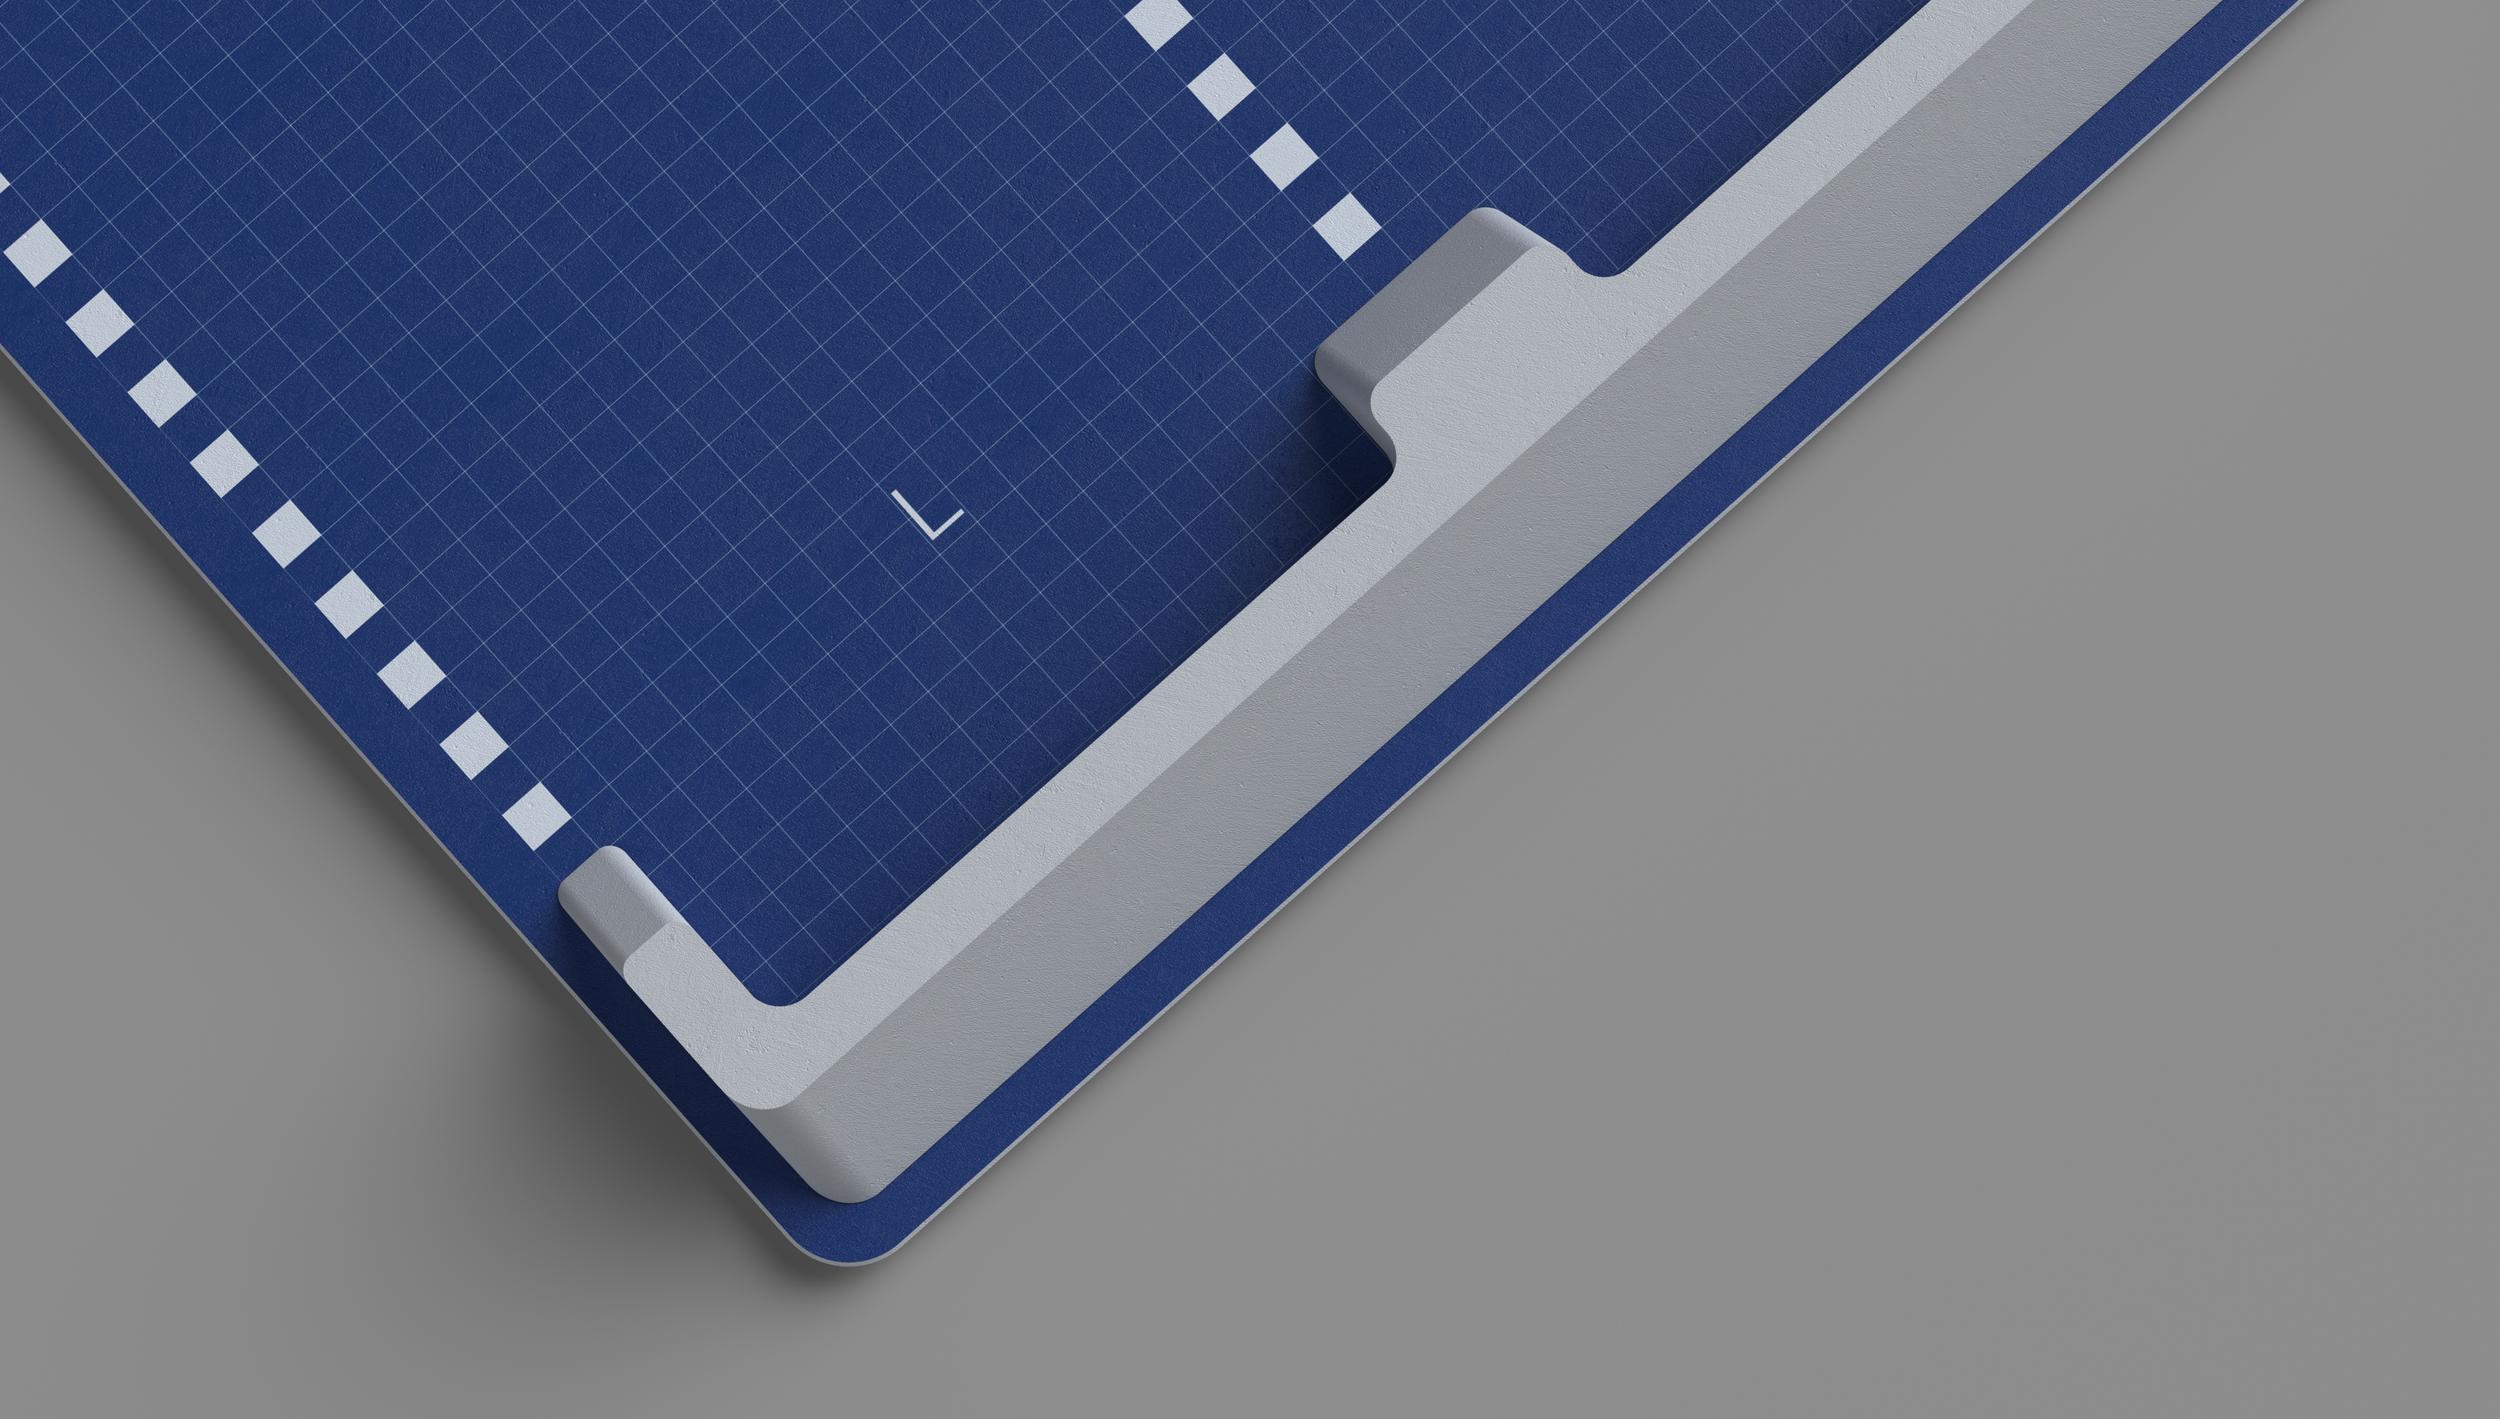 Mat_Design_24.png